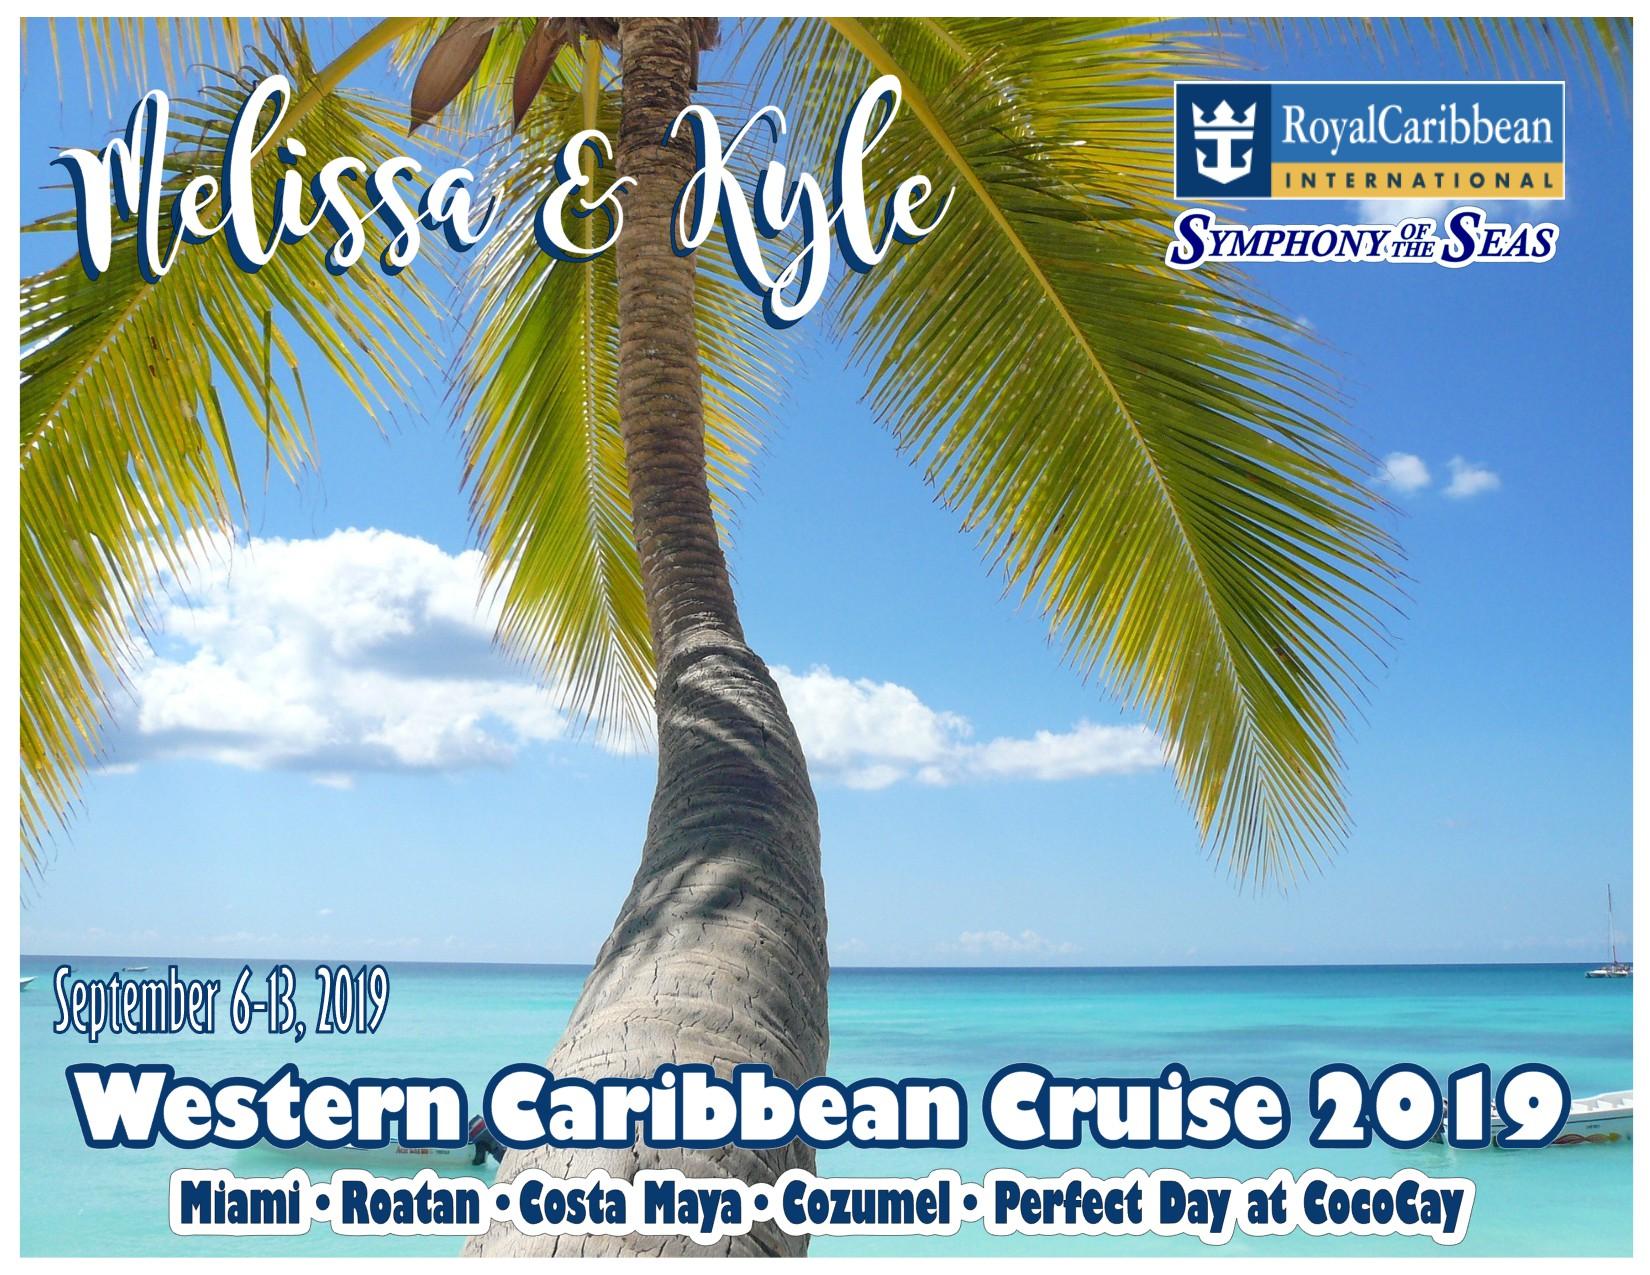 caribbean magnet 11a.jpg